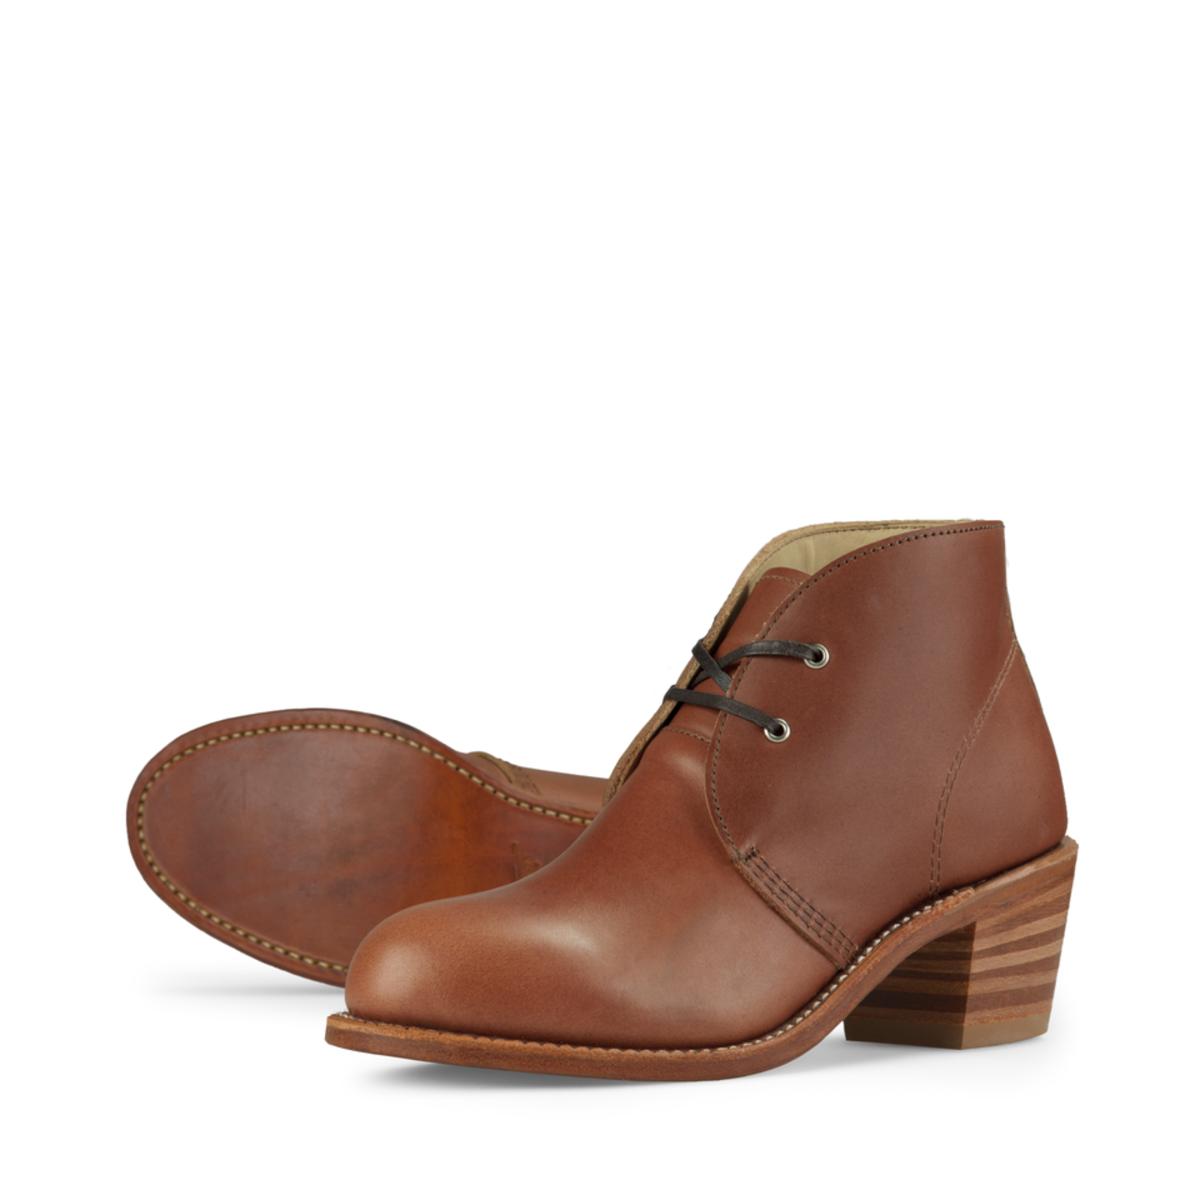 387e06ddf78b Red Wing Shoes Lillian No. 3395